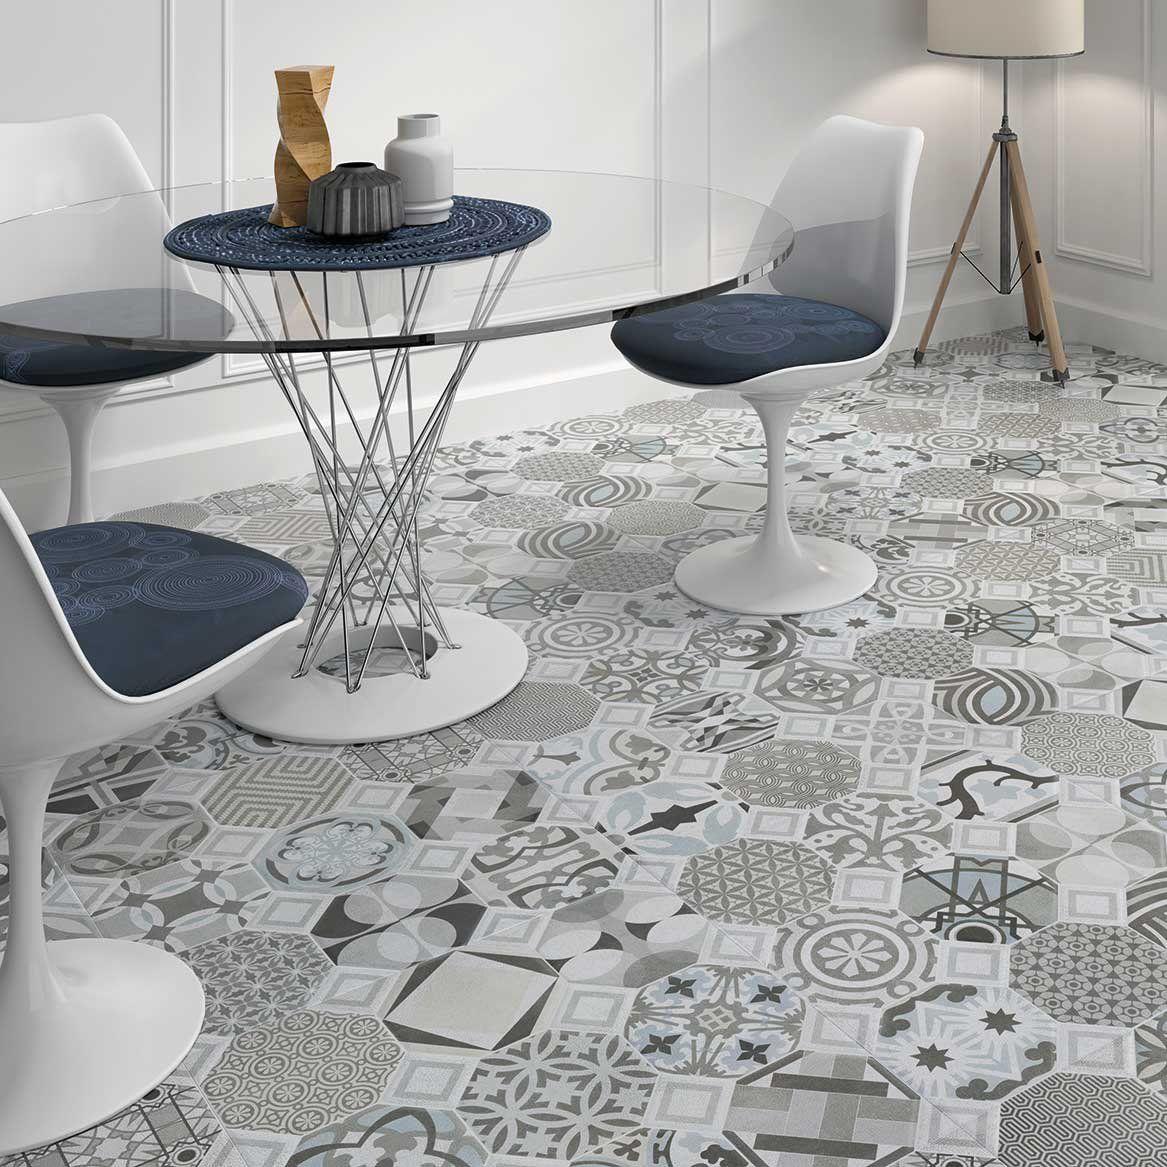 Geotiles Flow 1 Bluegrey Patterned 60x60cm Floor Tile Blue Grey